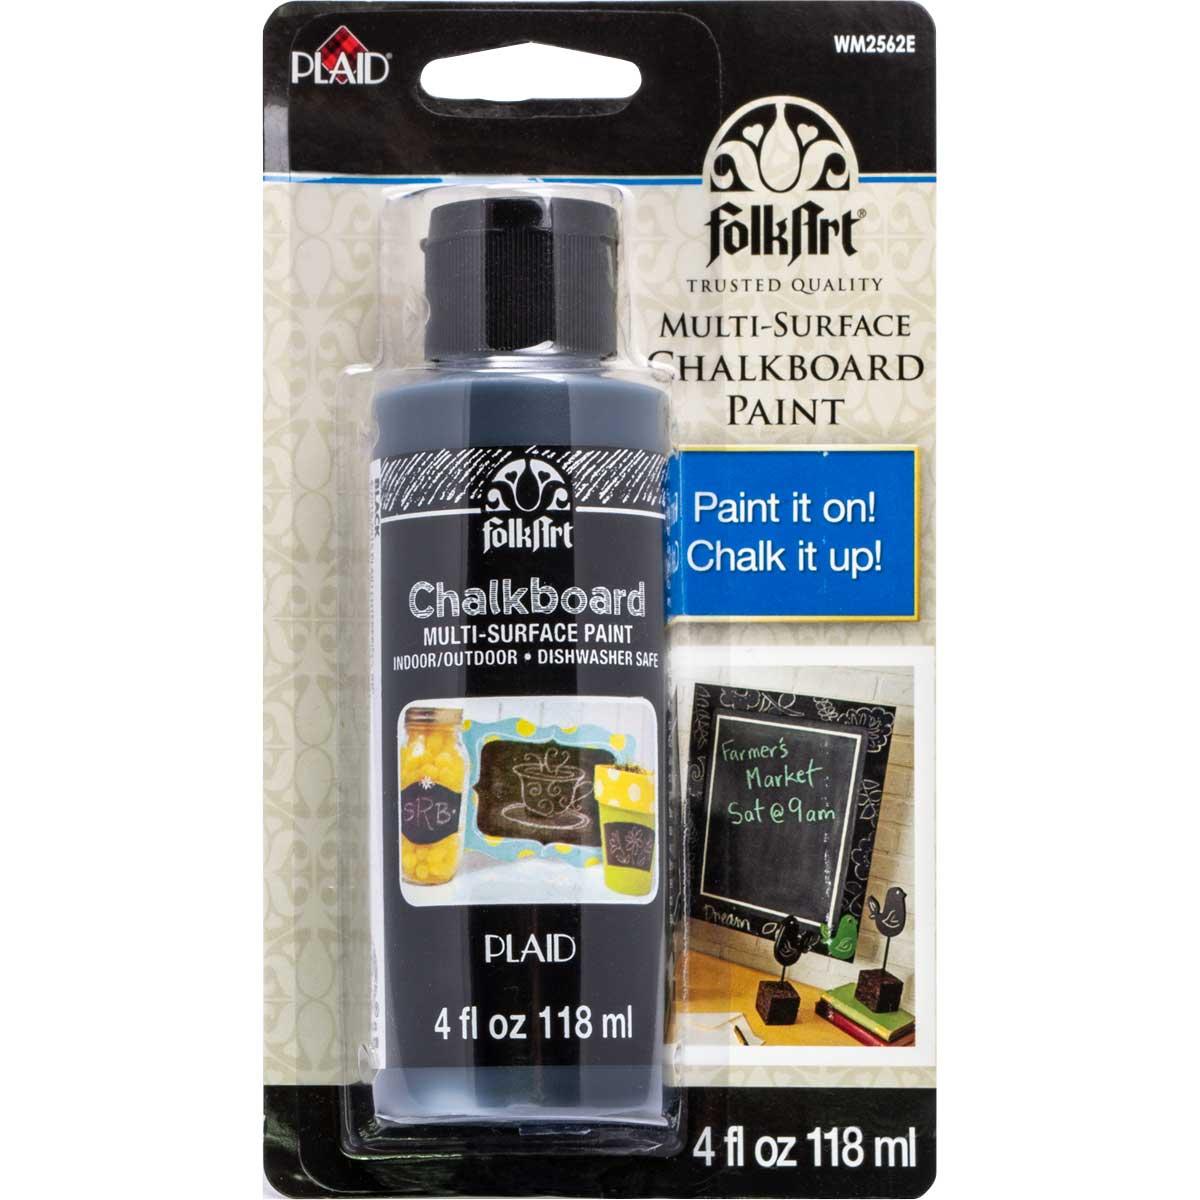 FolkArt ® Chalkboard Multi-Surface Paint - Black, 4 oz. - WM2562E